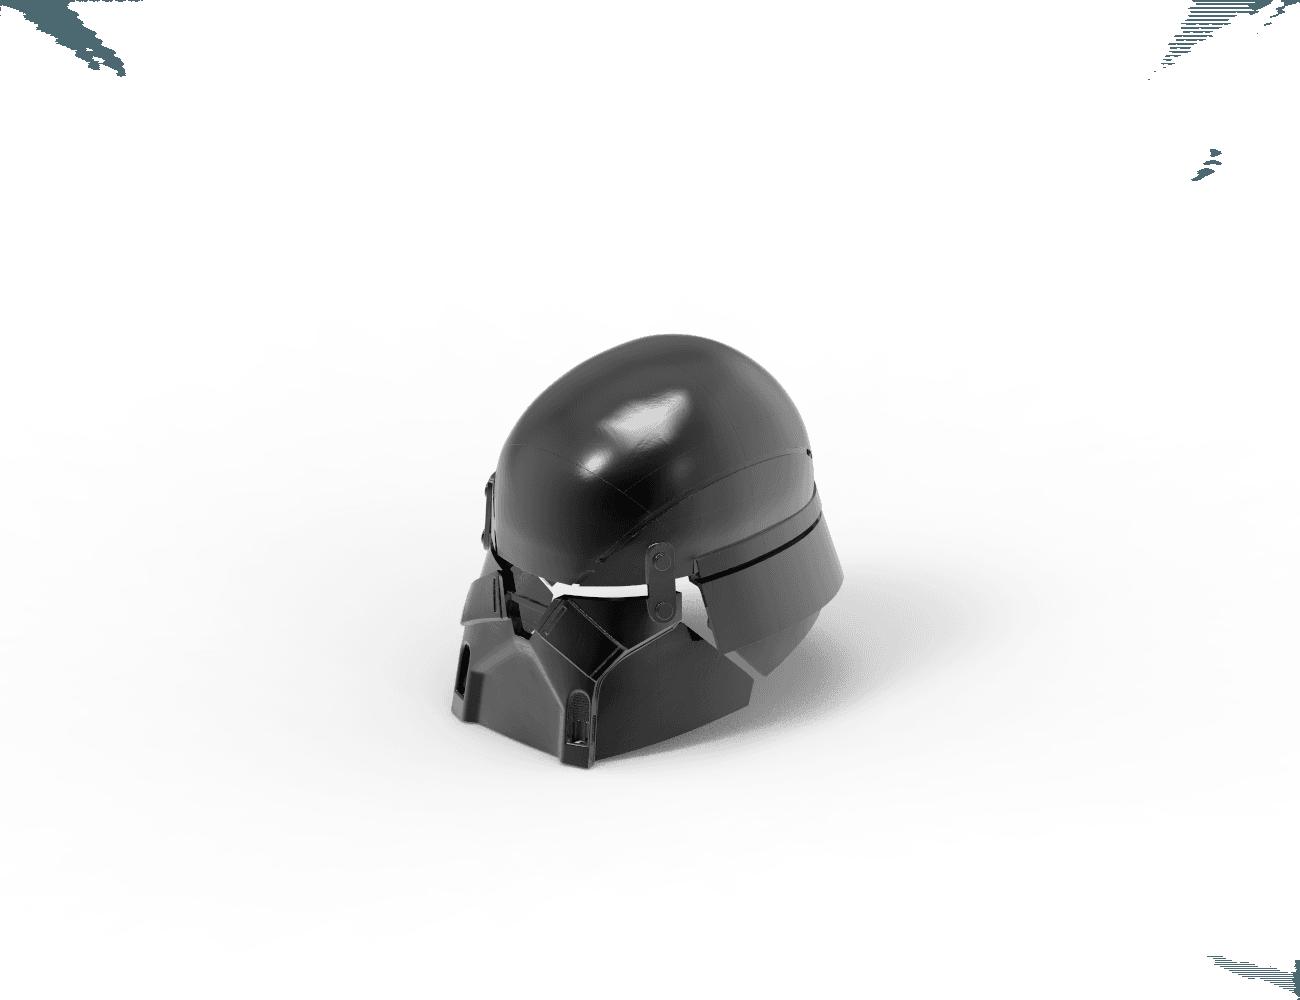 render_scene-isometric_parts.19.png Download STL file Armory - Knights of Ren Helmet, StarWars model for 3D Print • 3D printing design, 3D-mon